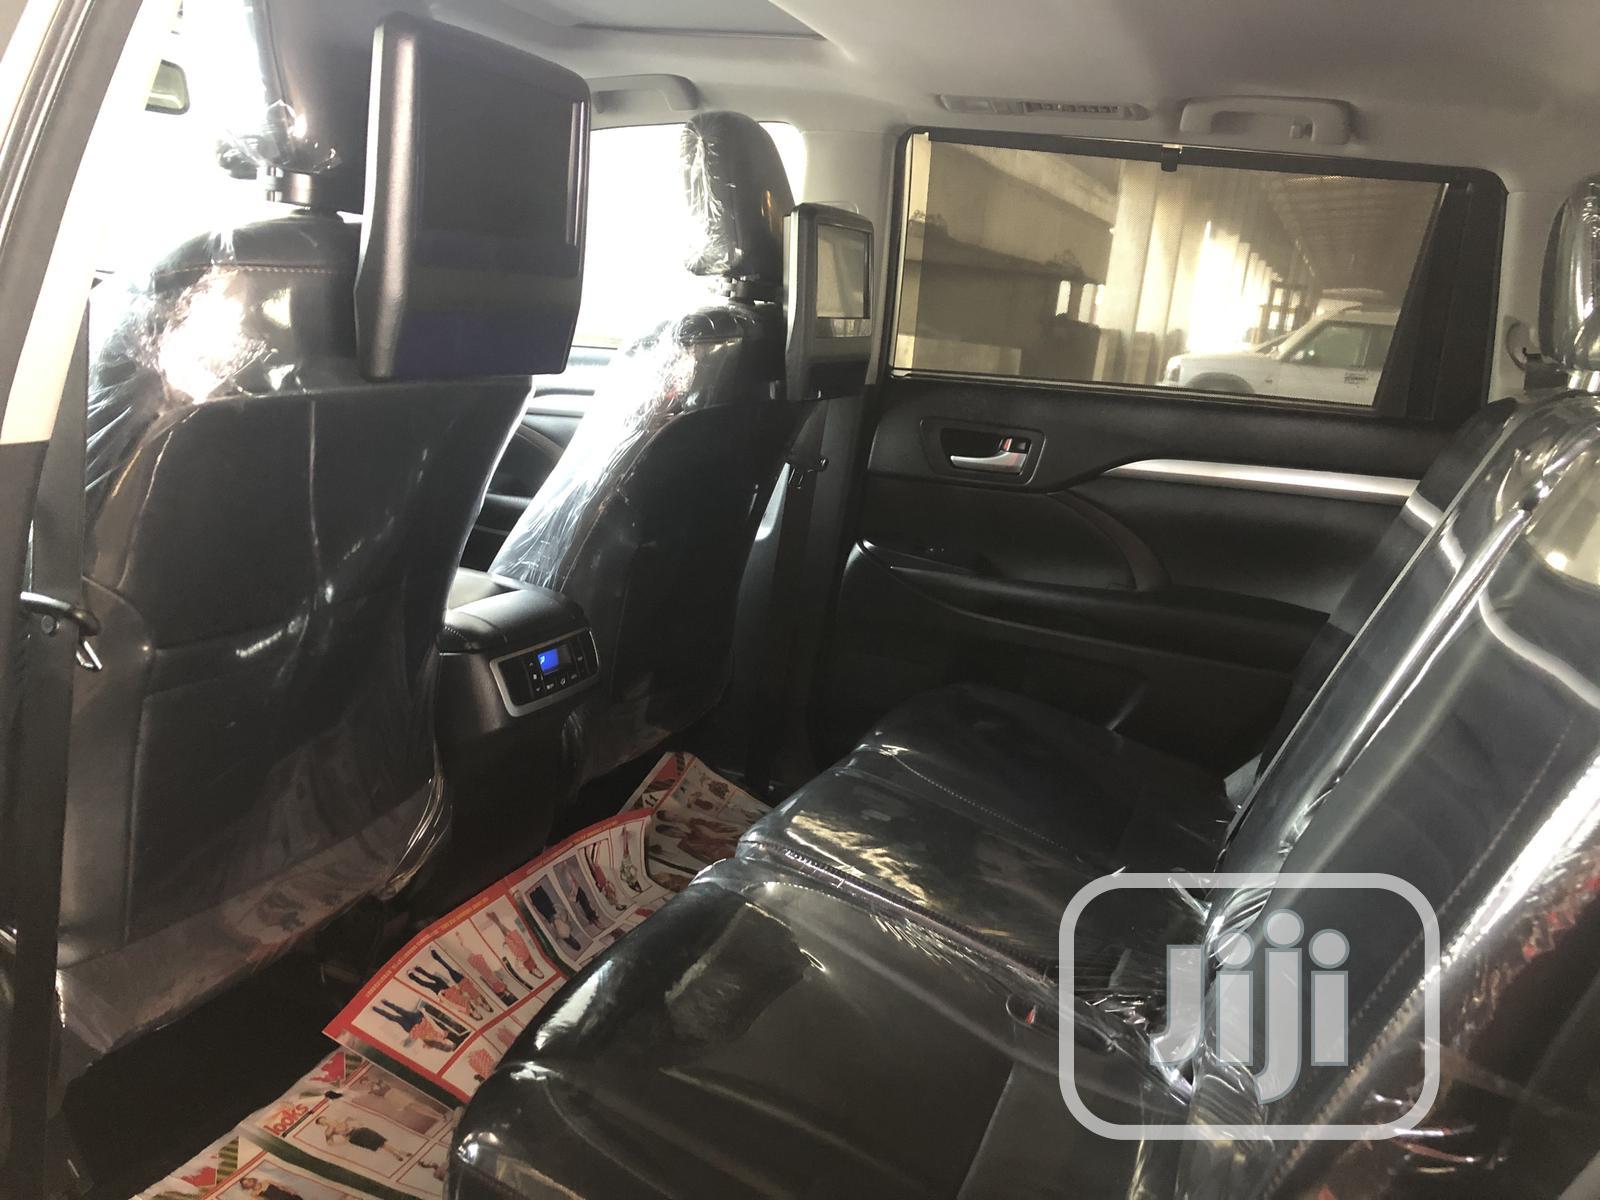 Toyota Highlander 2018 XLE 4x4 V6 (3.5L 6cyl 8A) Gold | Cars for sale in Apapa, Lagos State, Nigeria